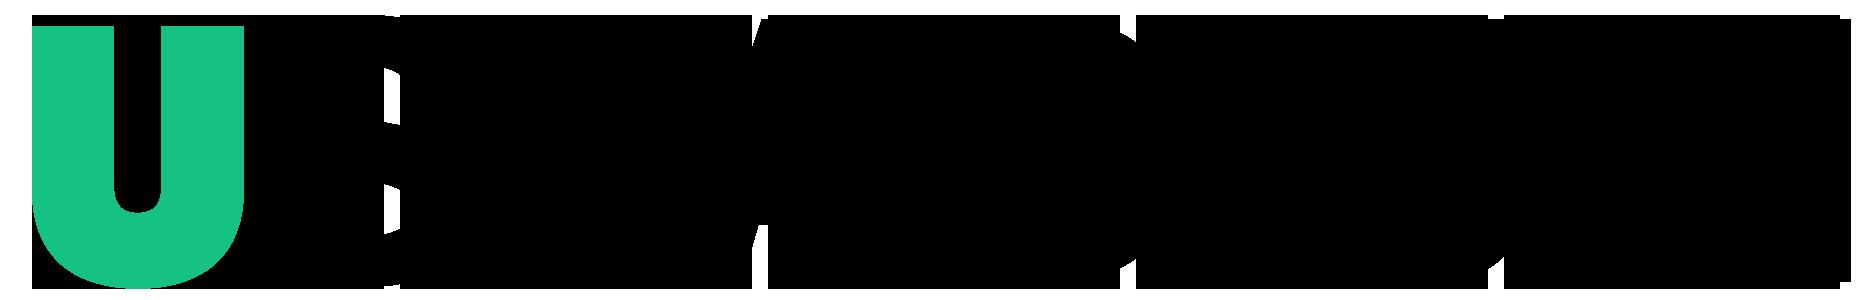 ustadium_logo.png